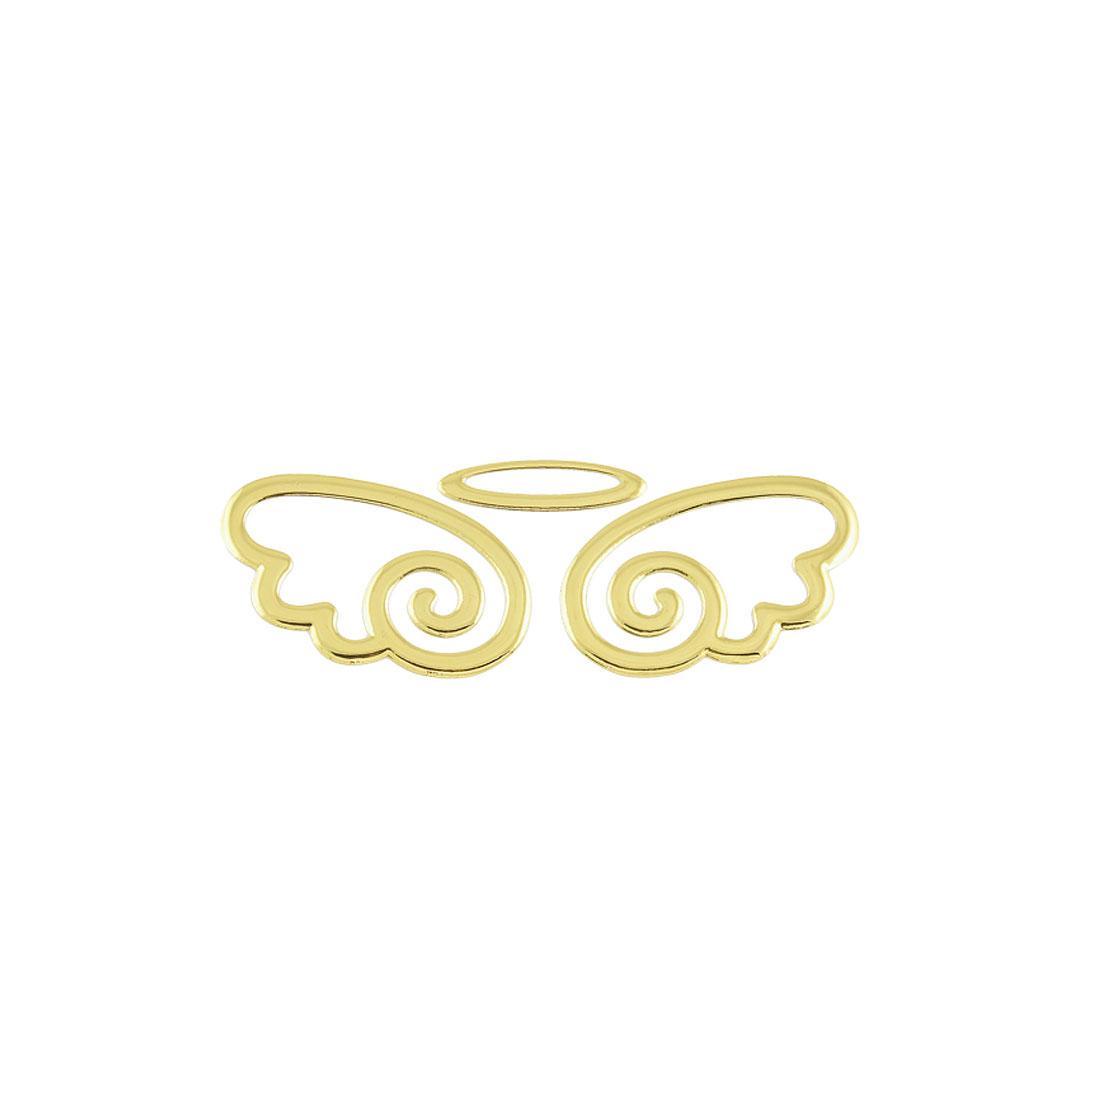 Car Auto Decorations 3D Angel Decal Sticker Emblem Logo Gold Tone